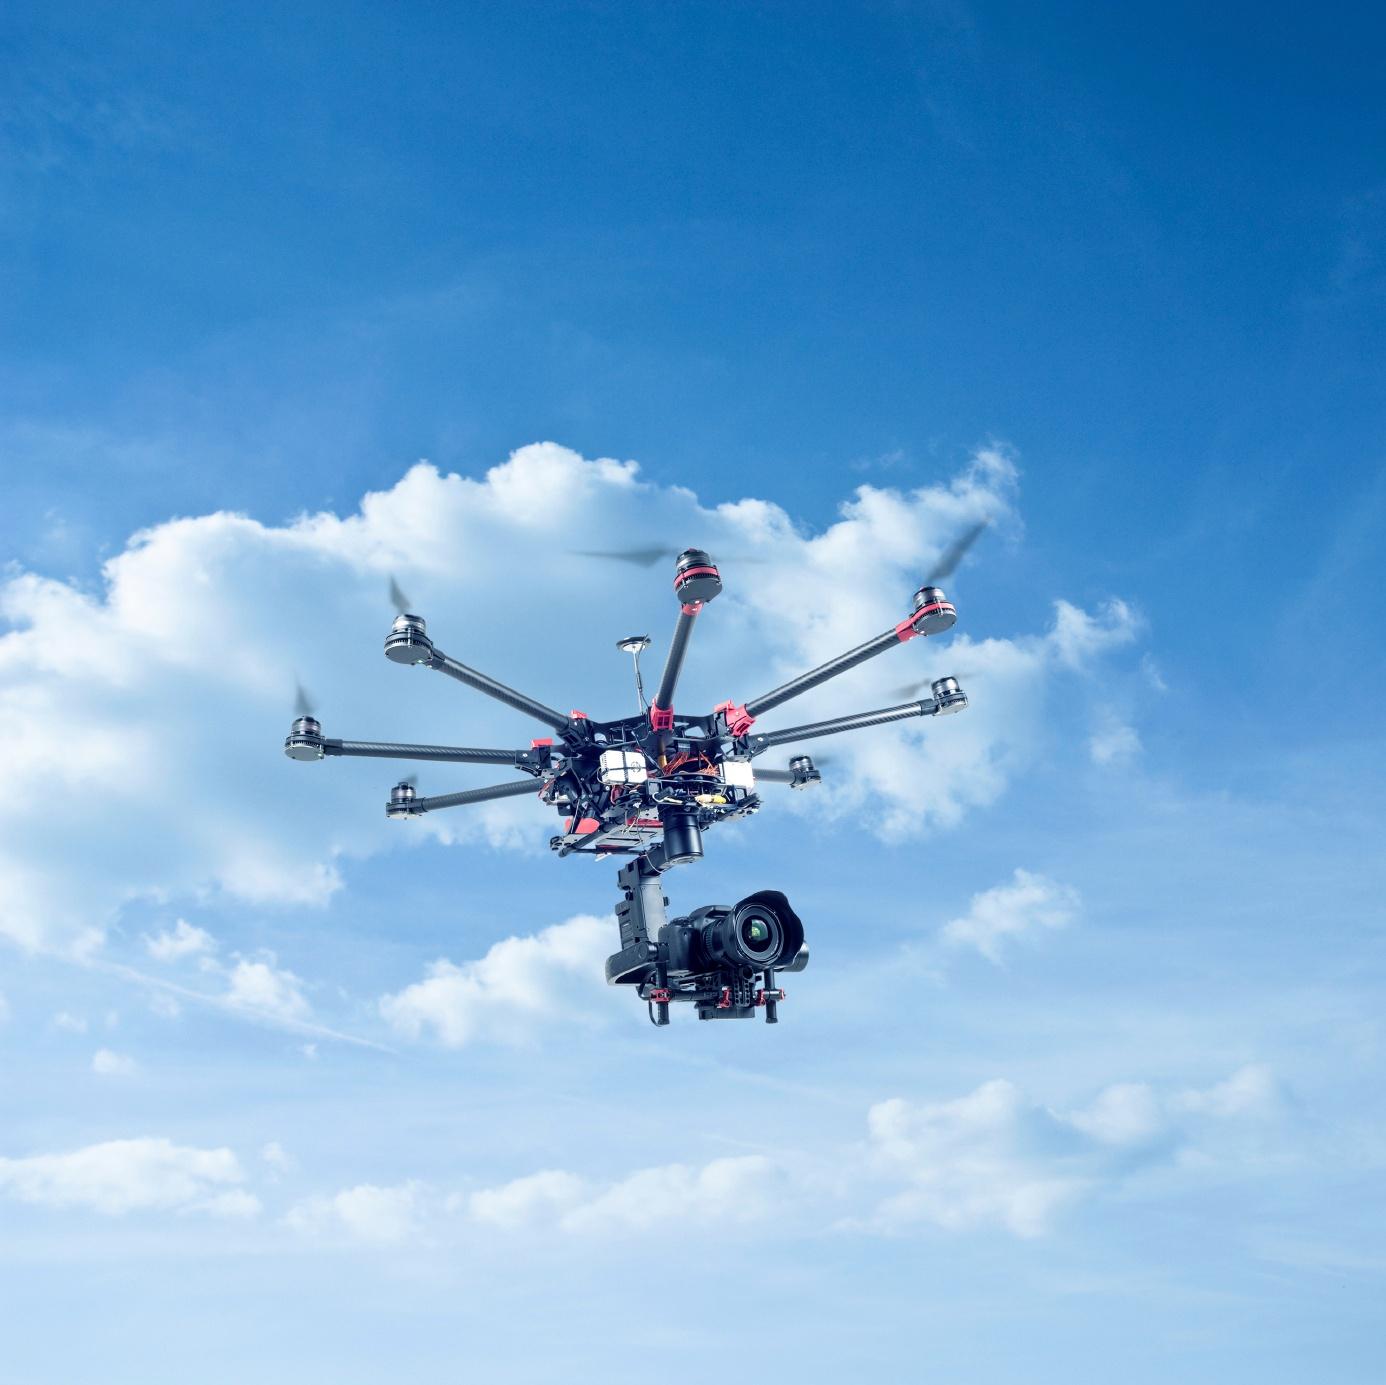 Drone-camera.jpg